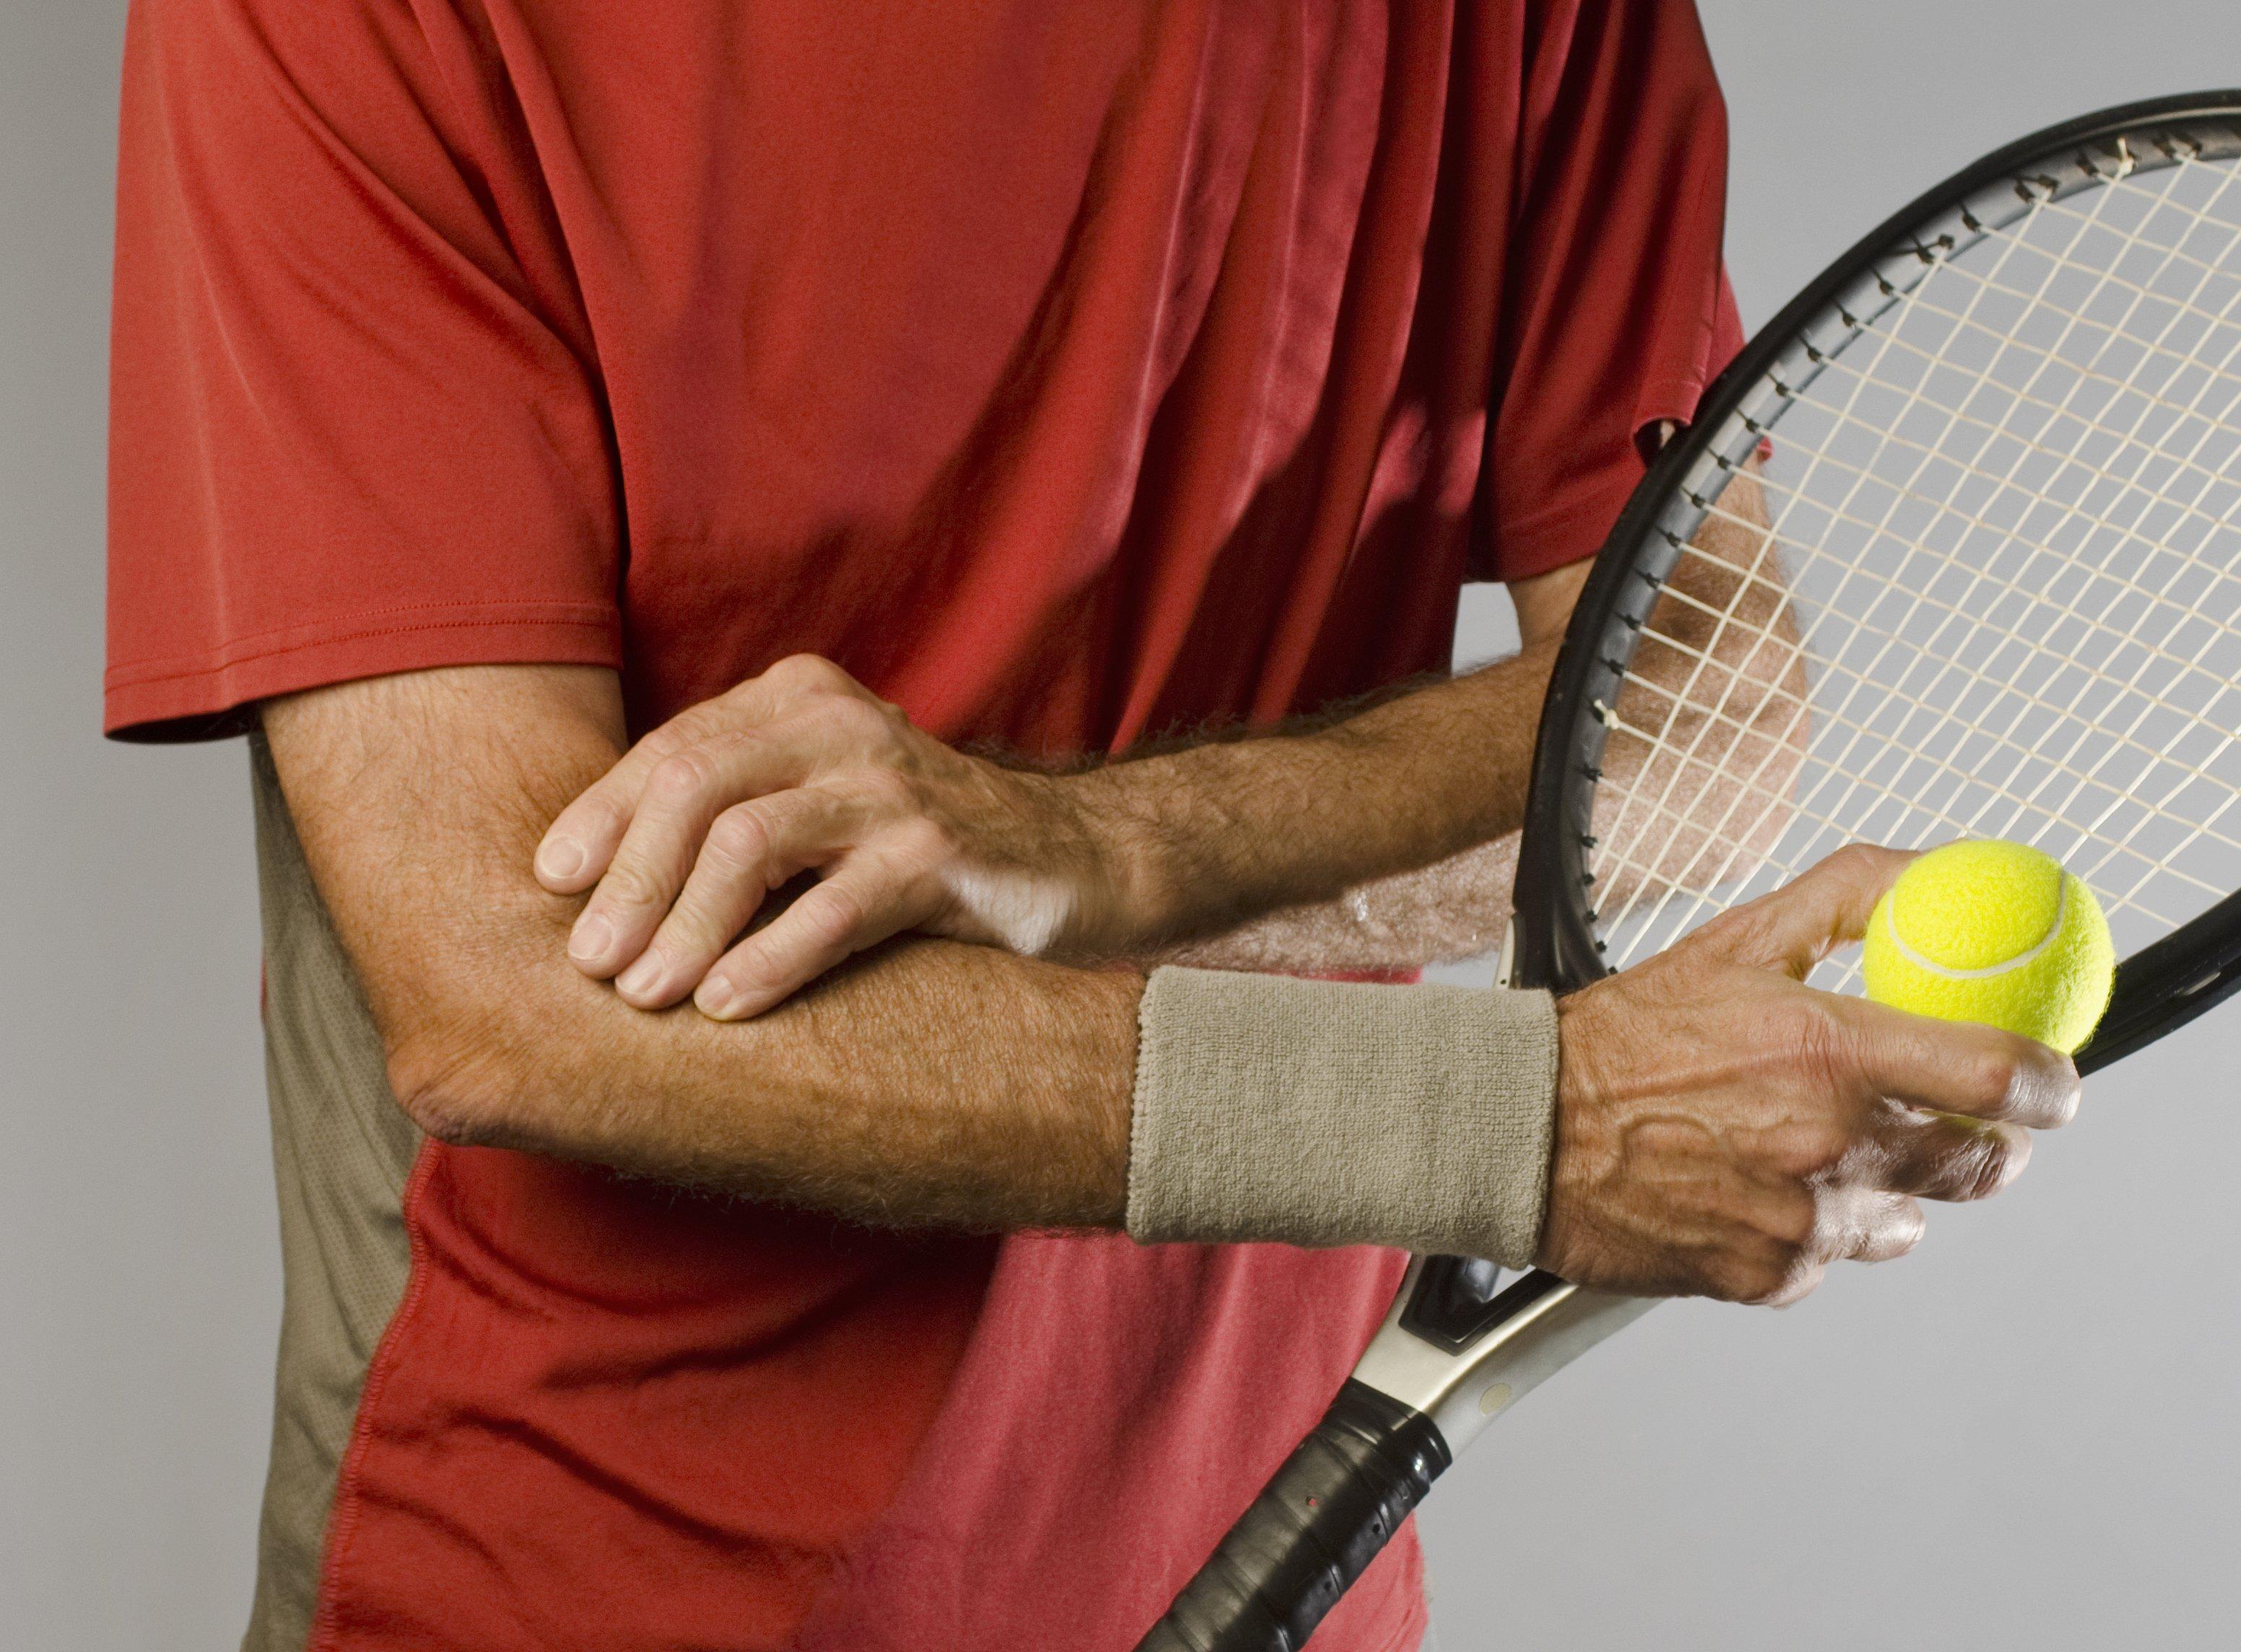 tennis elbow athletes pain relief